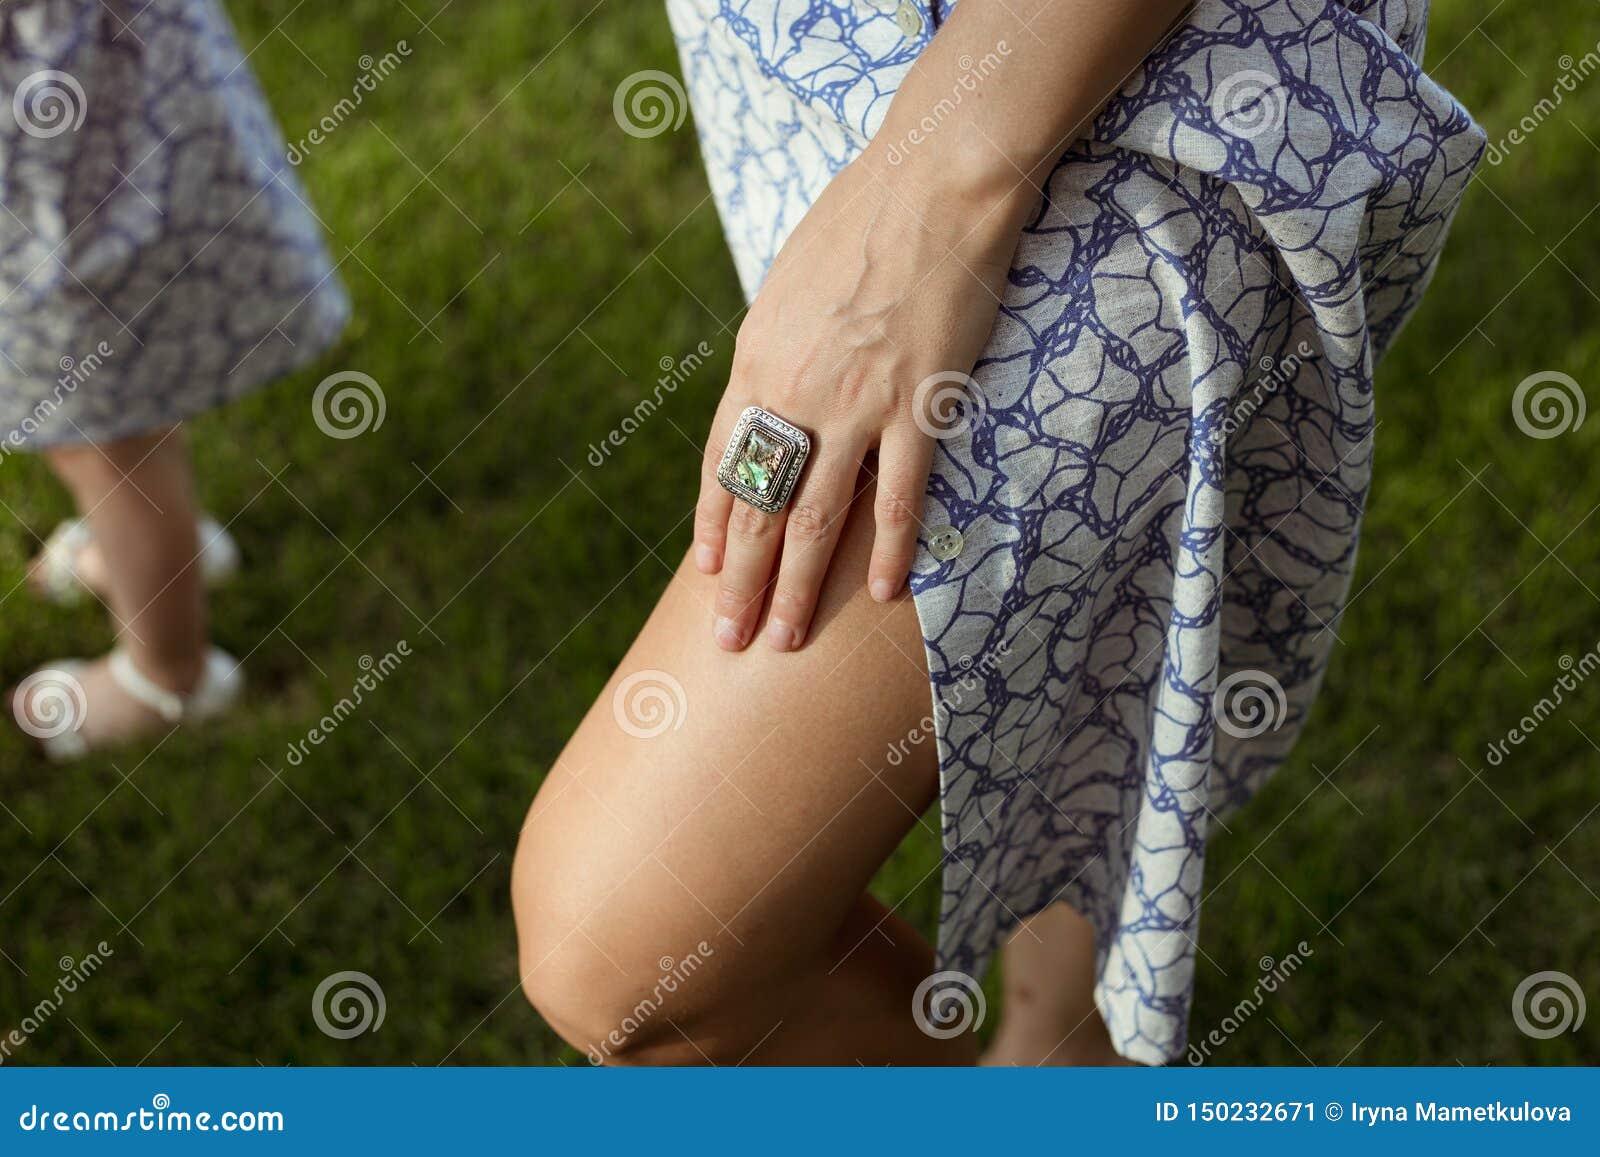 Sunburnt women legs in summer cloth and hand